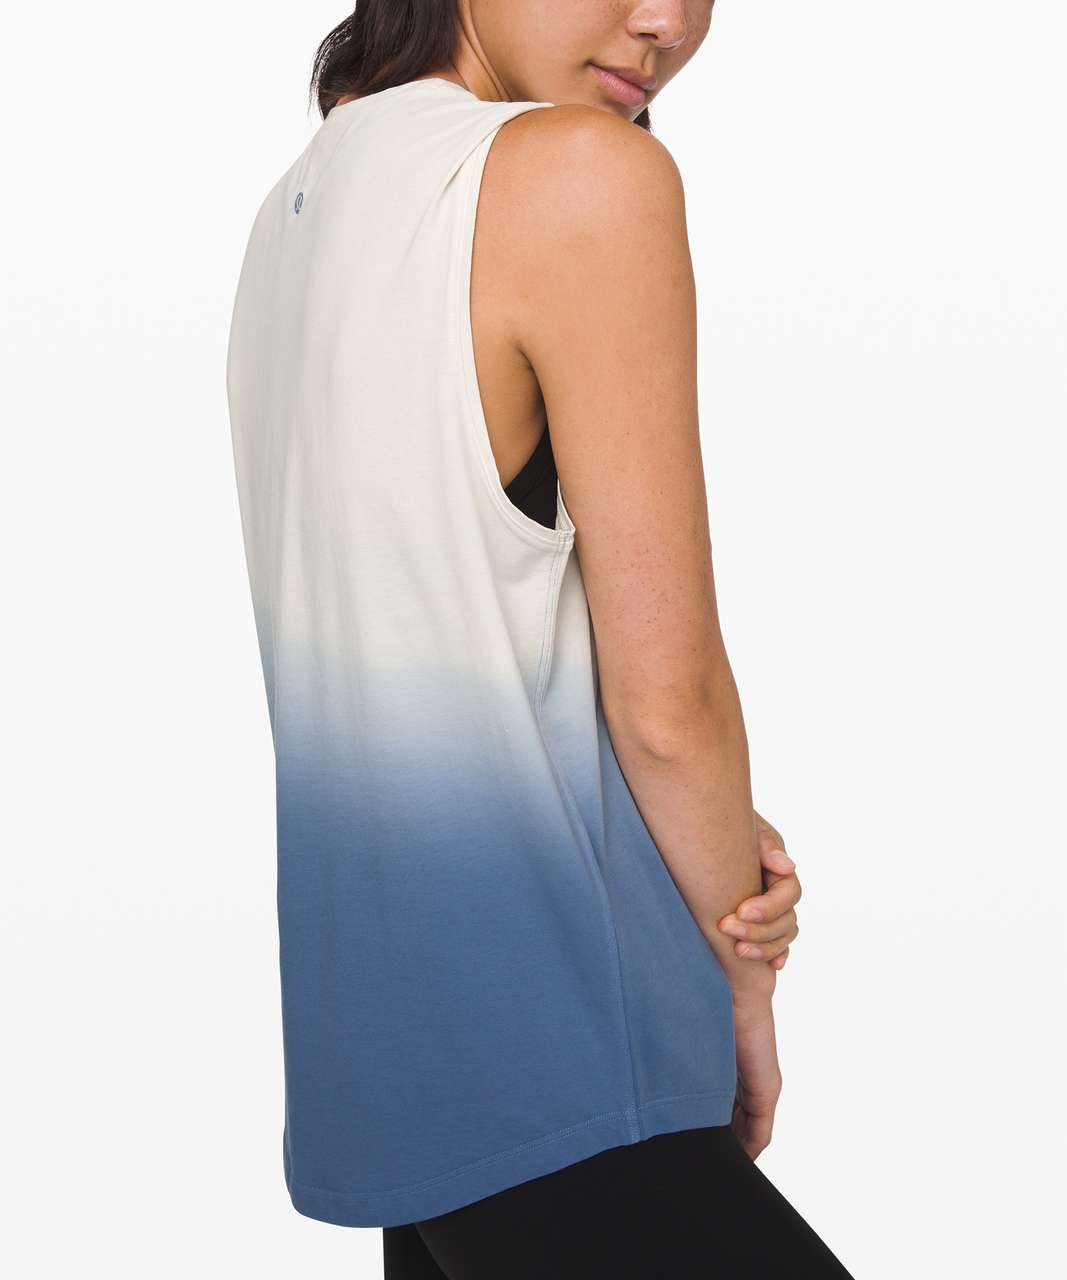 Lululemon Brunswick Muscle Tank *Dip Dye - Light Ivory / Tempest Blue